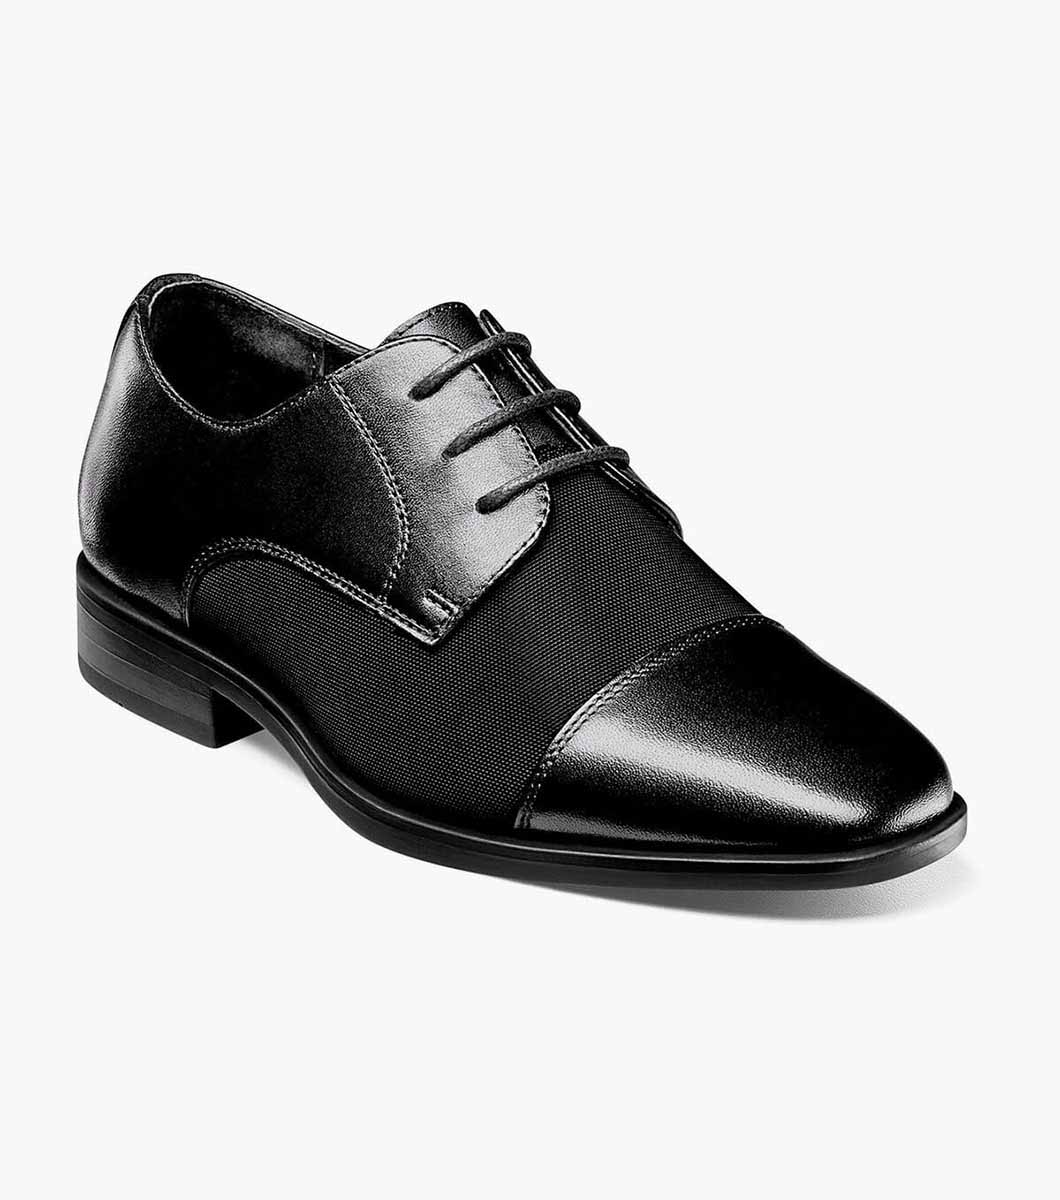 Boy's Dress Shoes | Black Cap Toe